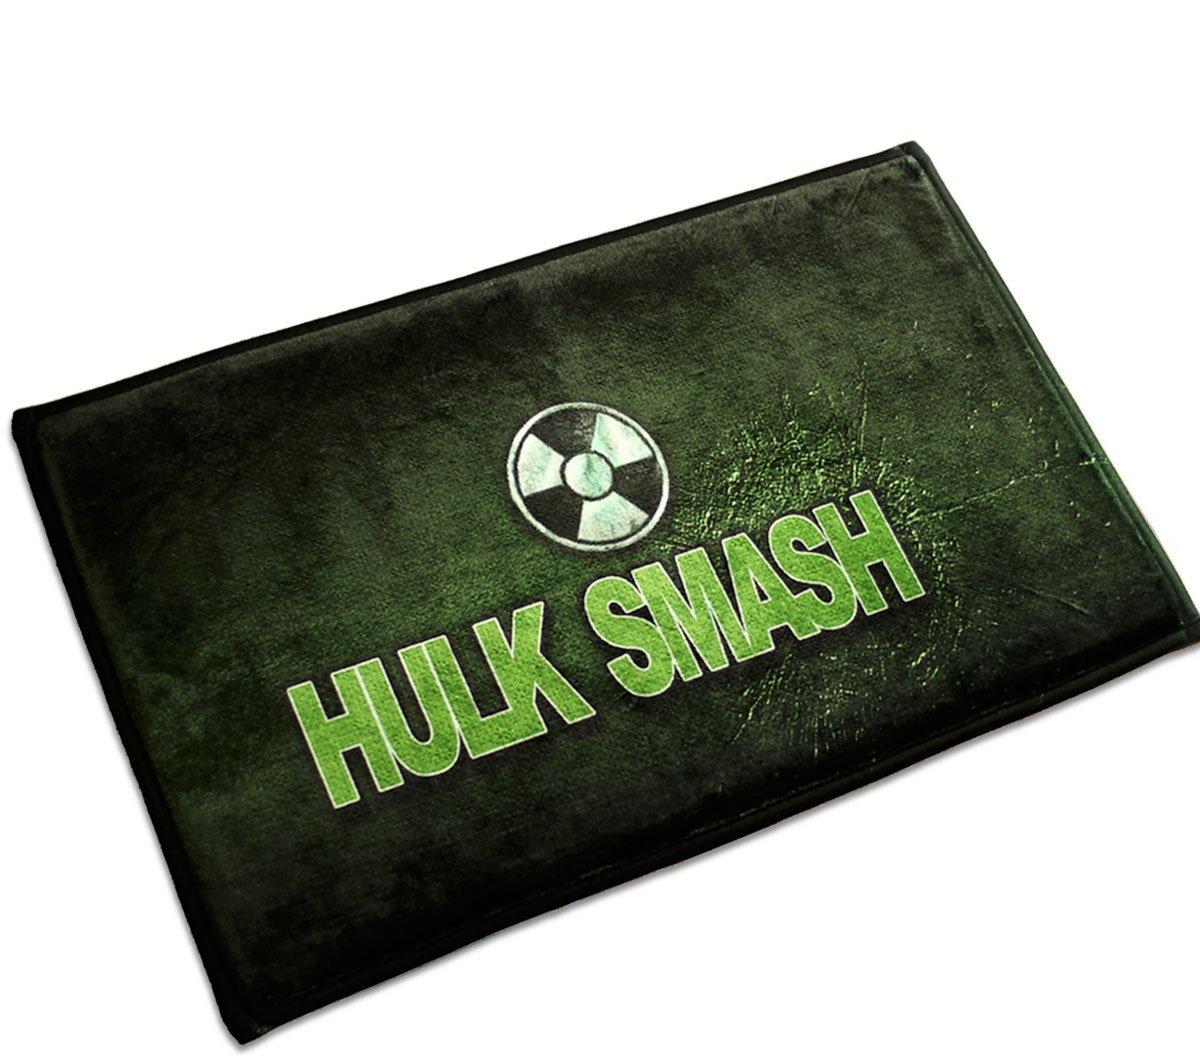 HULK SMASH Mats Cover Non-Slip Machine Washable Outdoor Indoor Bathroom Kitchen Decor Rug ,